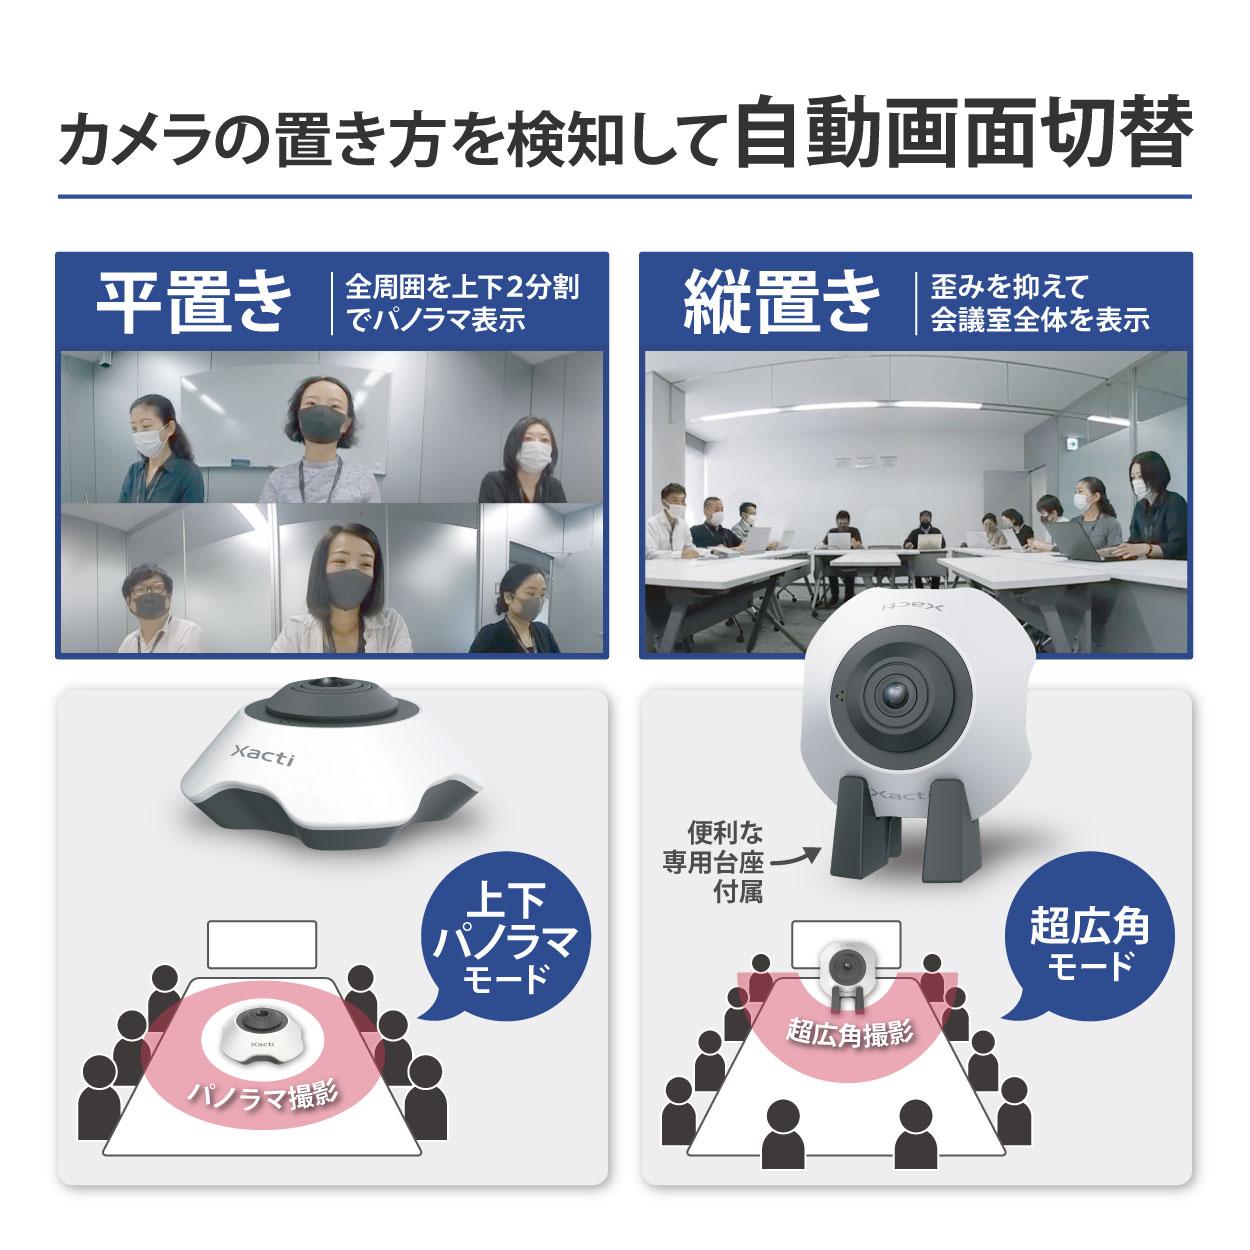 360°Web会議カメラ CX-MT100